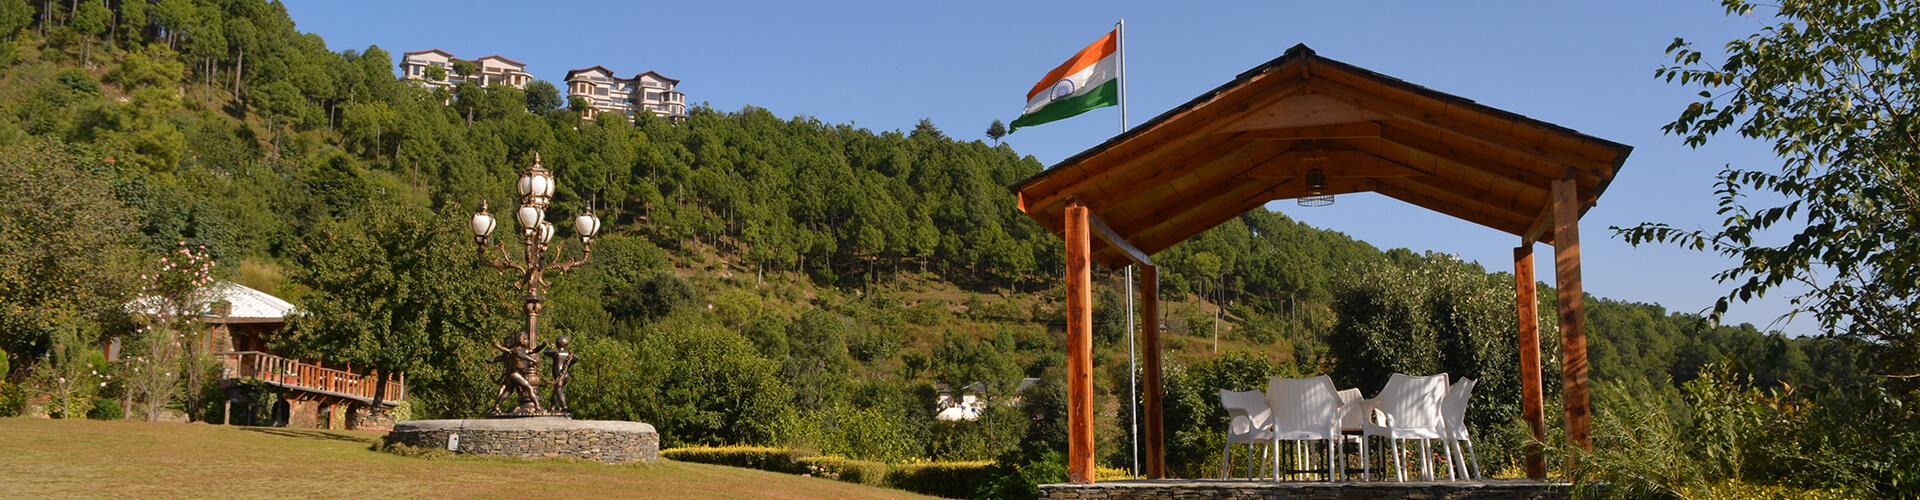 about-auramah-valley-shimla